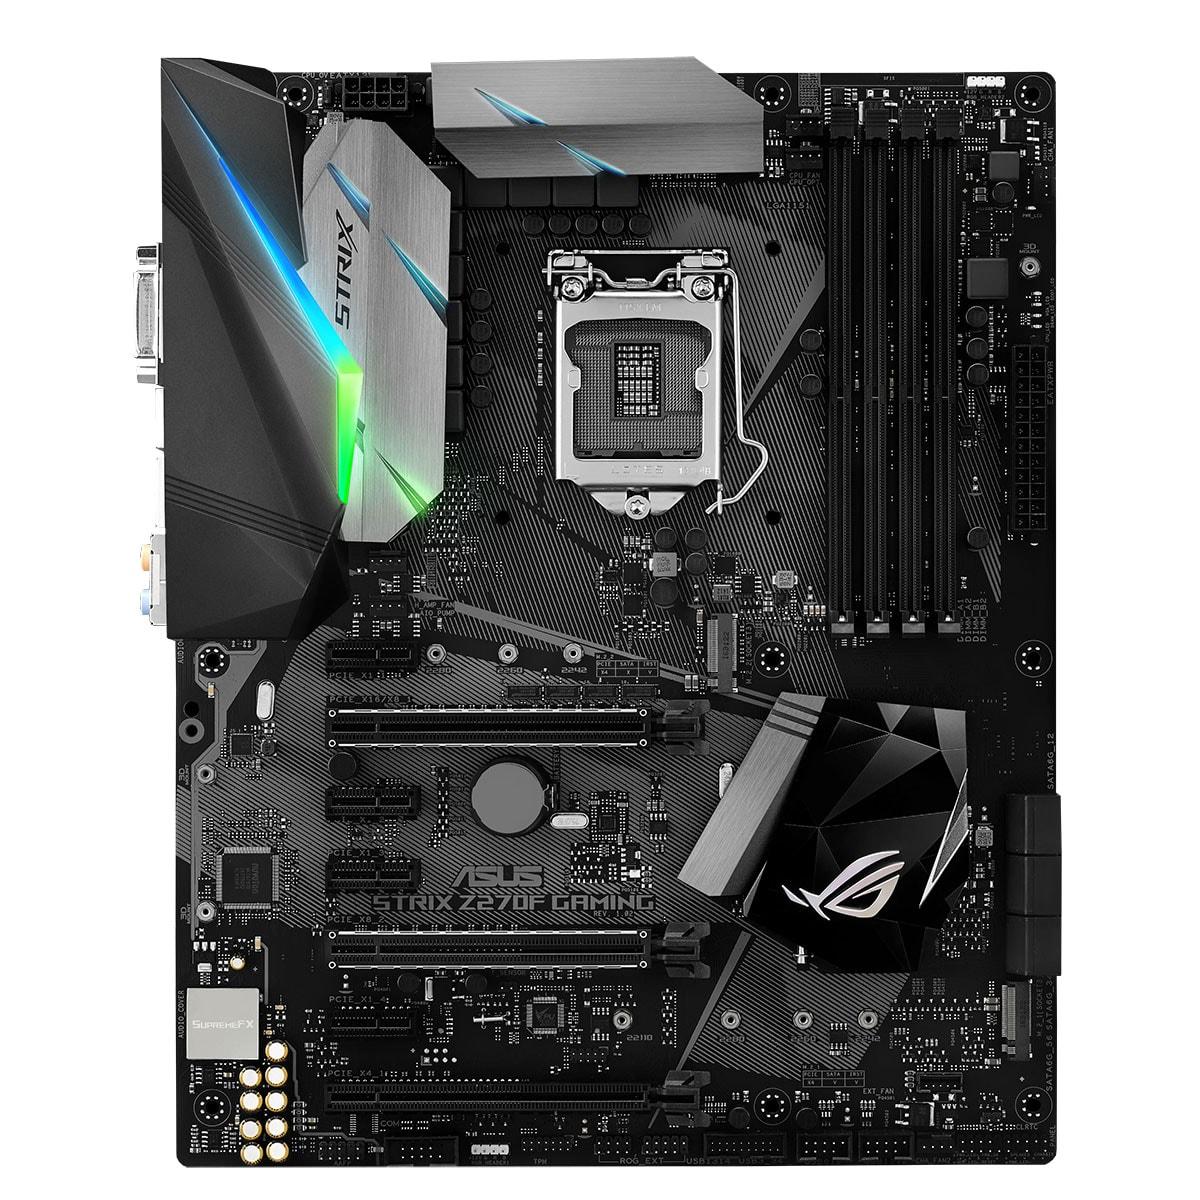 Asus STRIX Z270F Gaming ATX DDR4 - Carte mère Asus - Cybertek.fr - 2